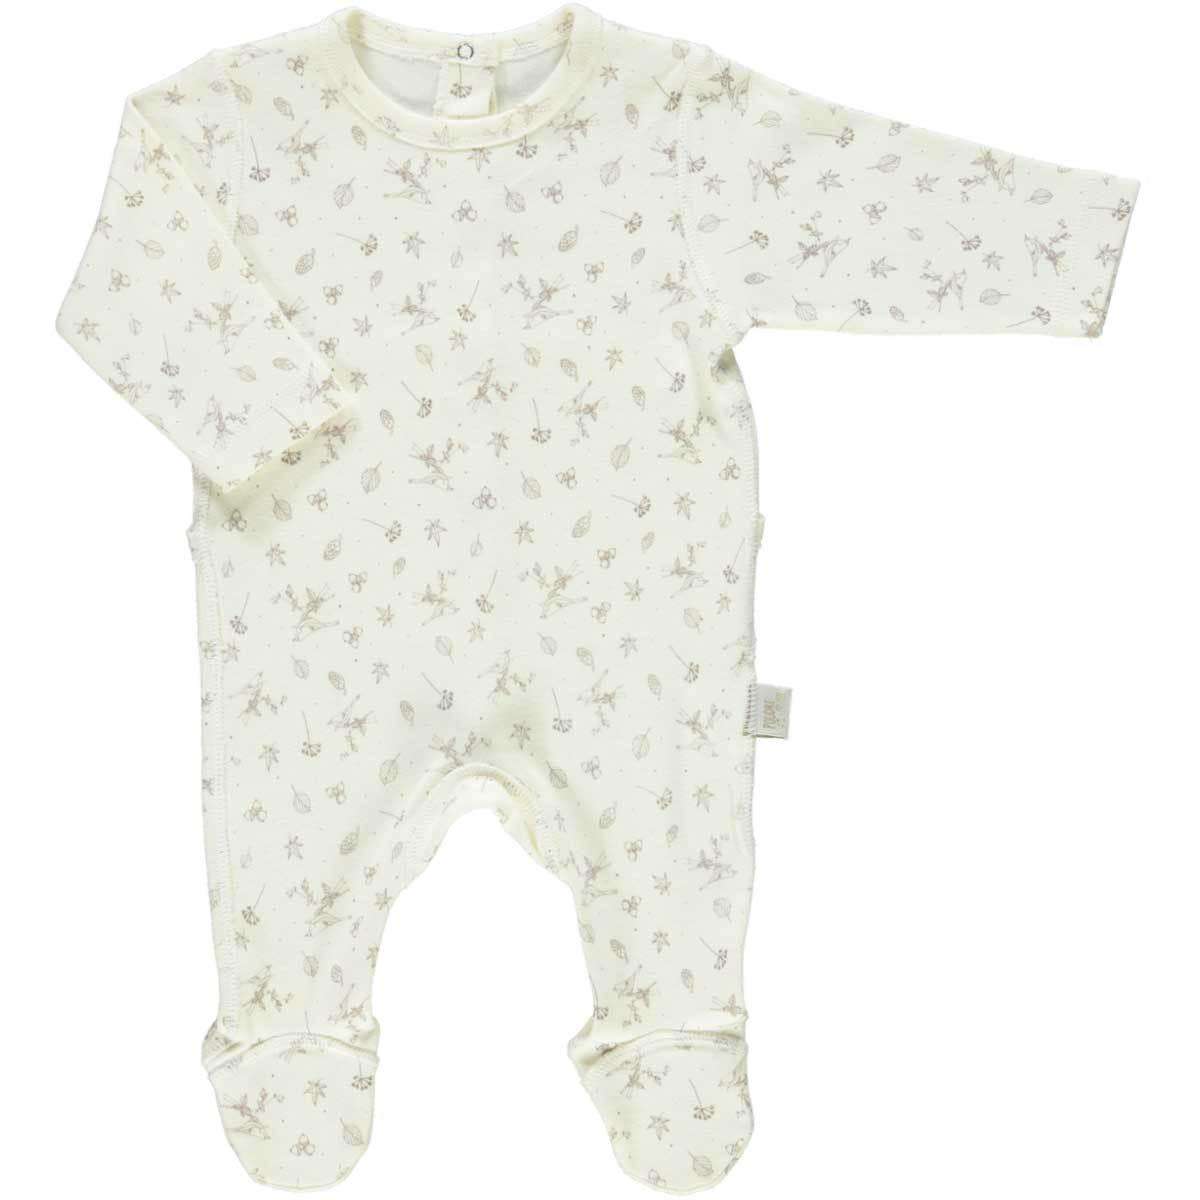 poudre organic pyjama ponteira lait 18 mois body et pyjama poudre organic sur l 39 armoire de b b. Black Bedroom Furniture Sets. Home Design Ideas